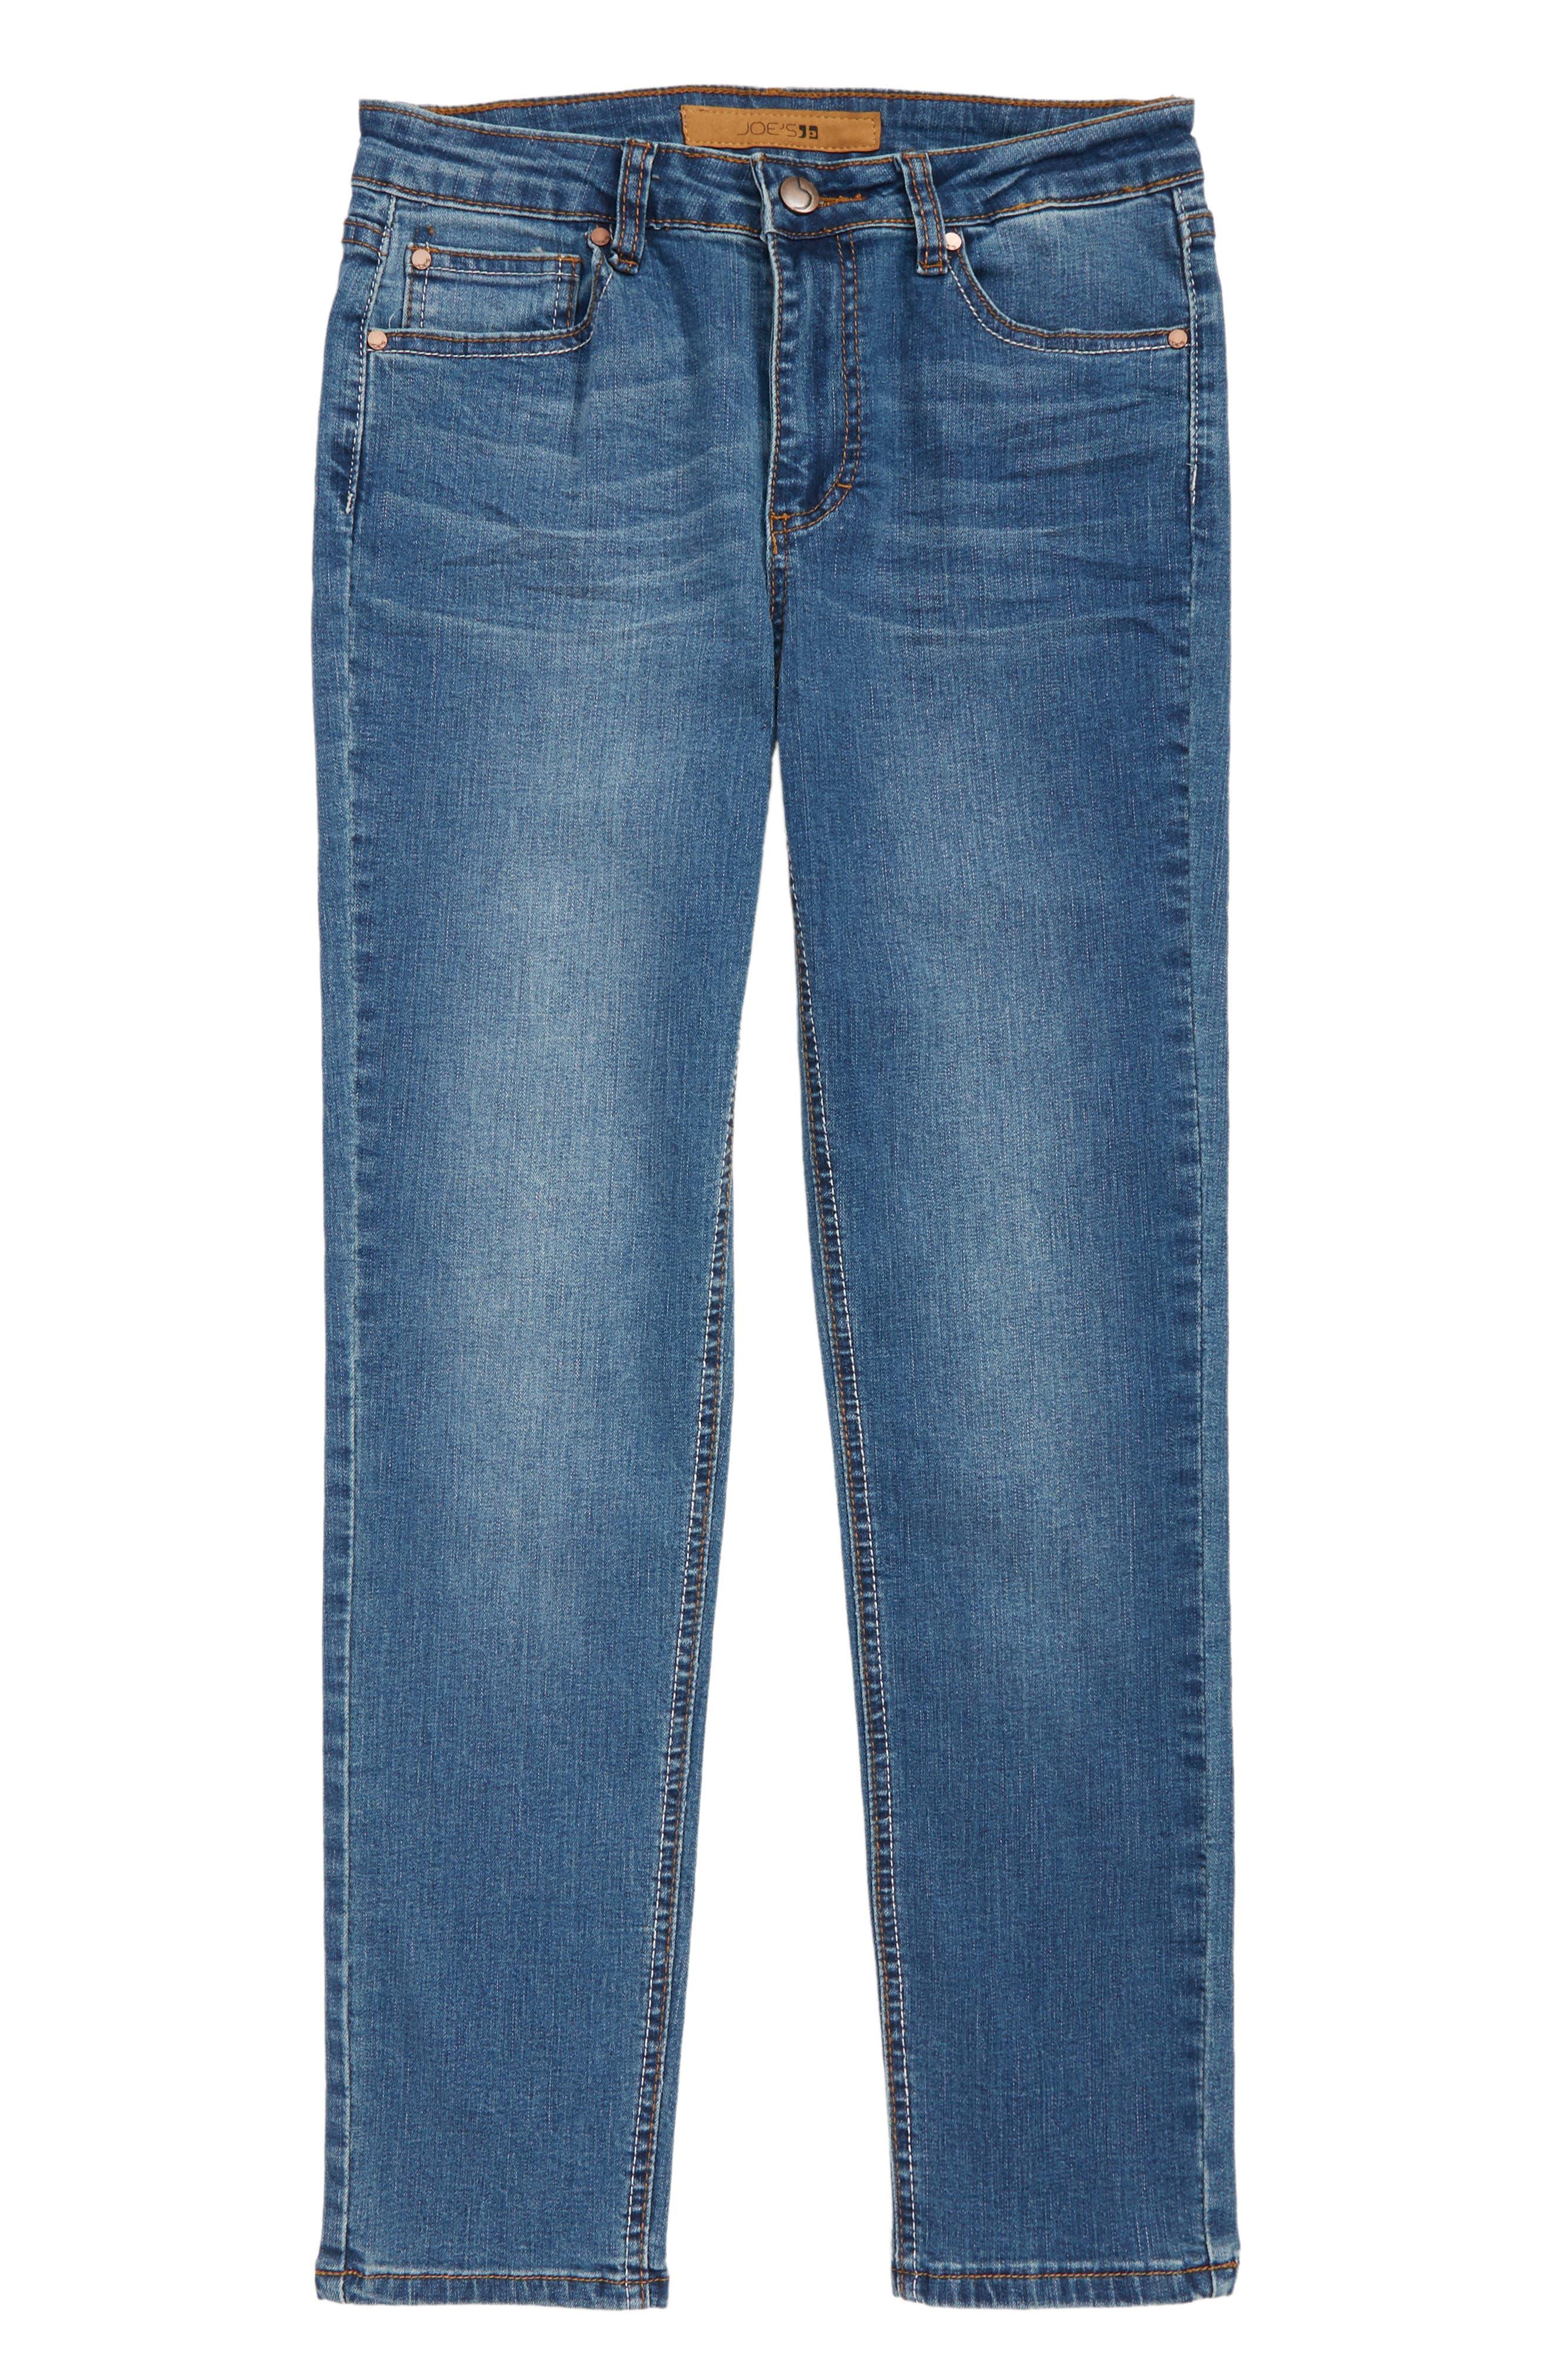 Brixton Stretch Jeans,                             Main thumbnail 1, color,                             DRESDEN BLUE